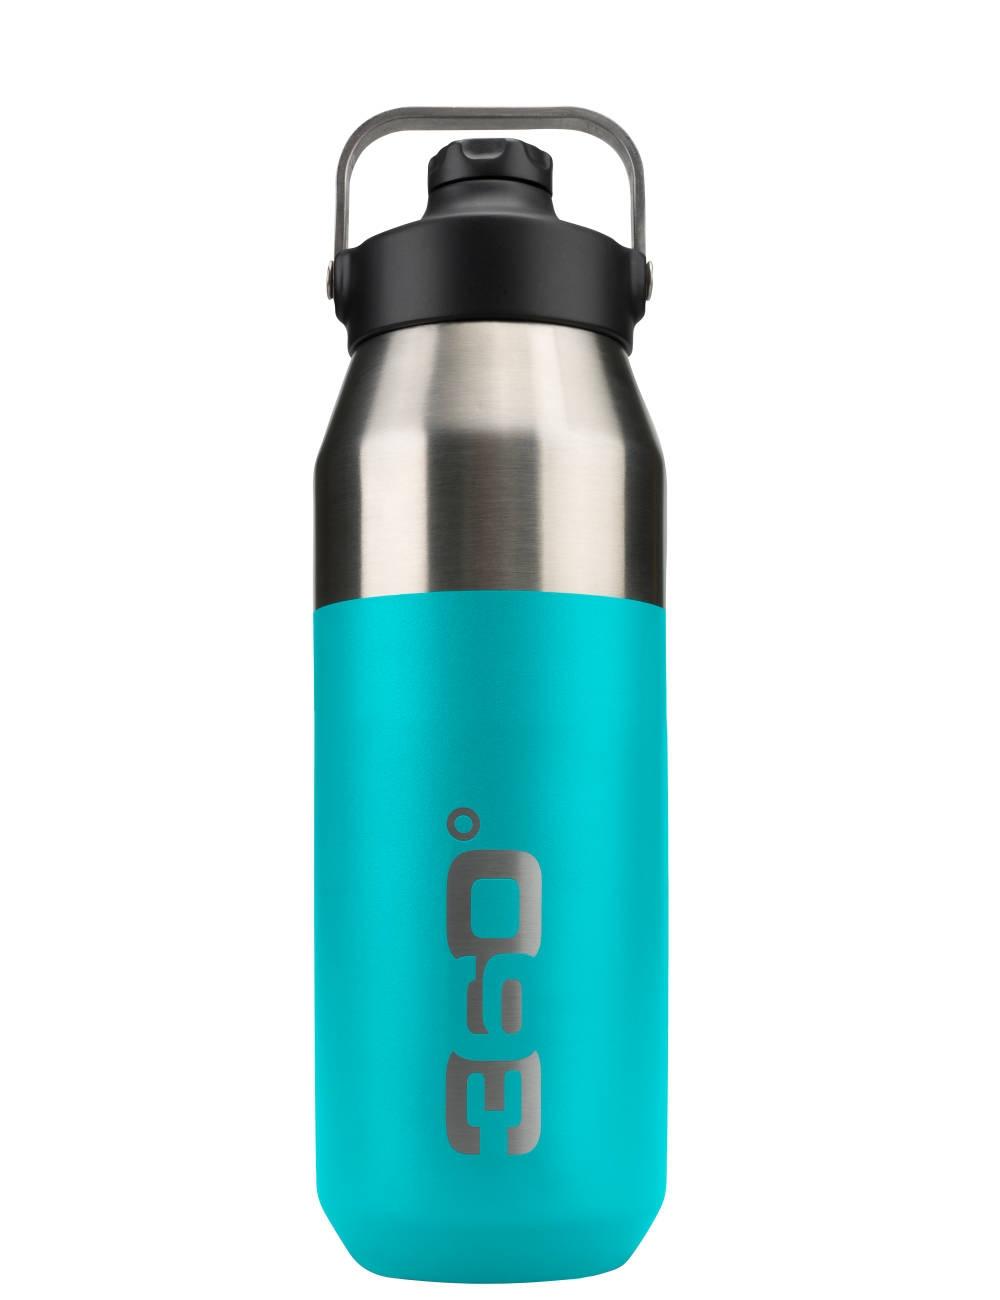 Bidon Izolator Inox 360 Degrees 750 Ml Cu Capac Si Dop Magnetic - Teal